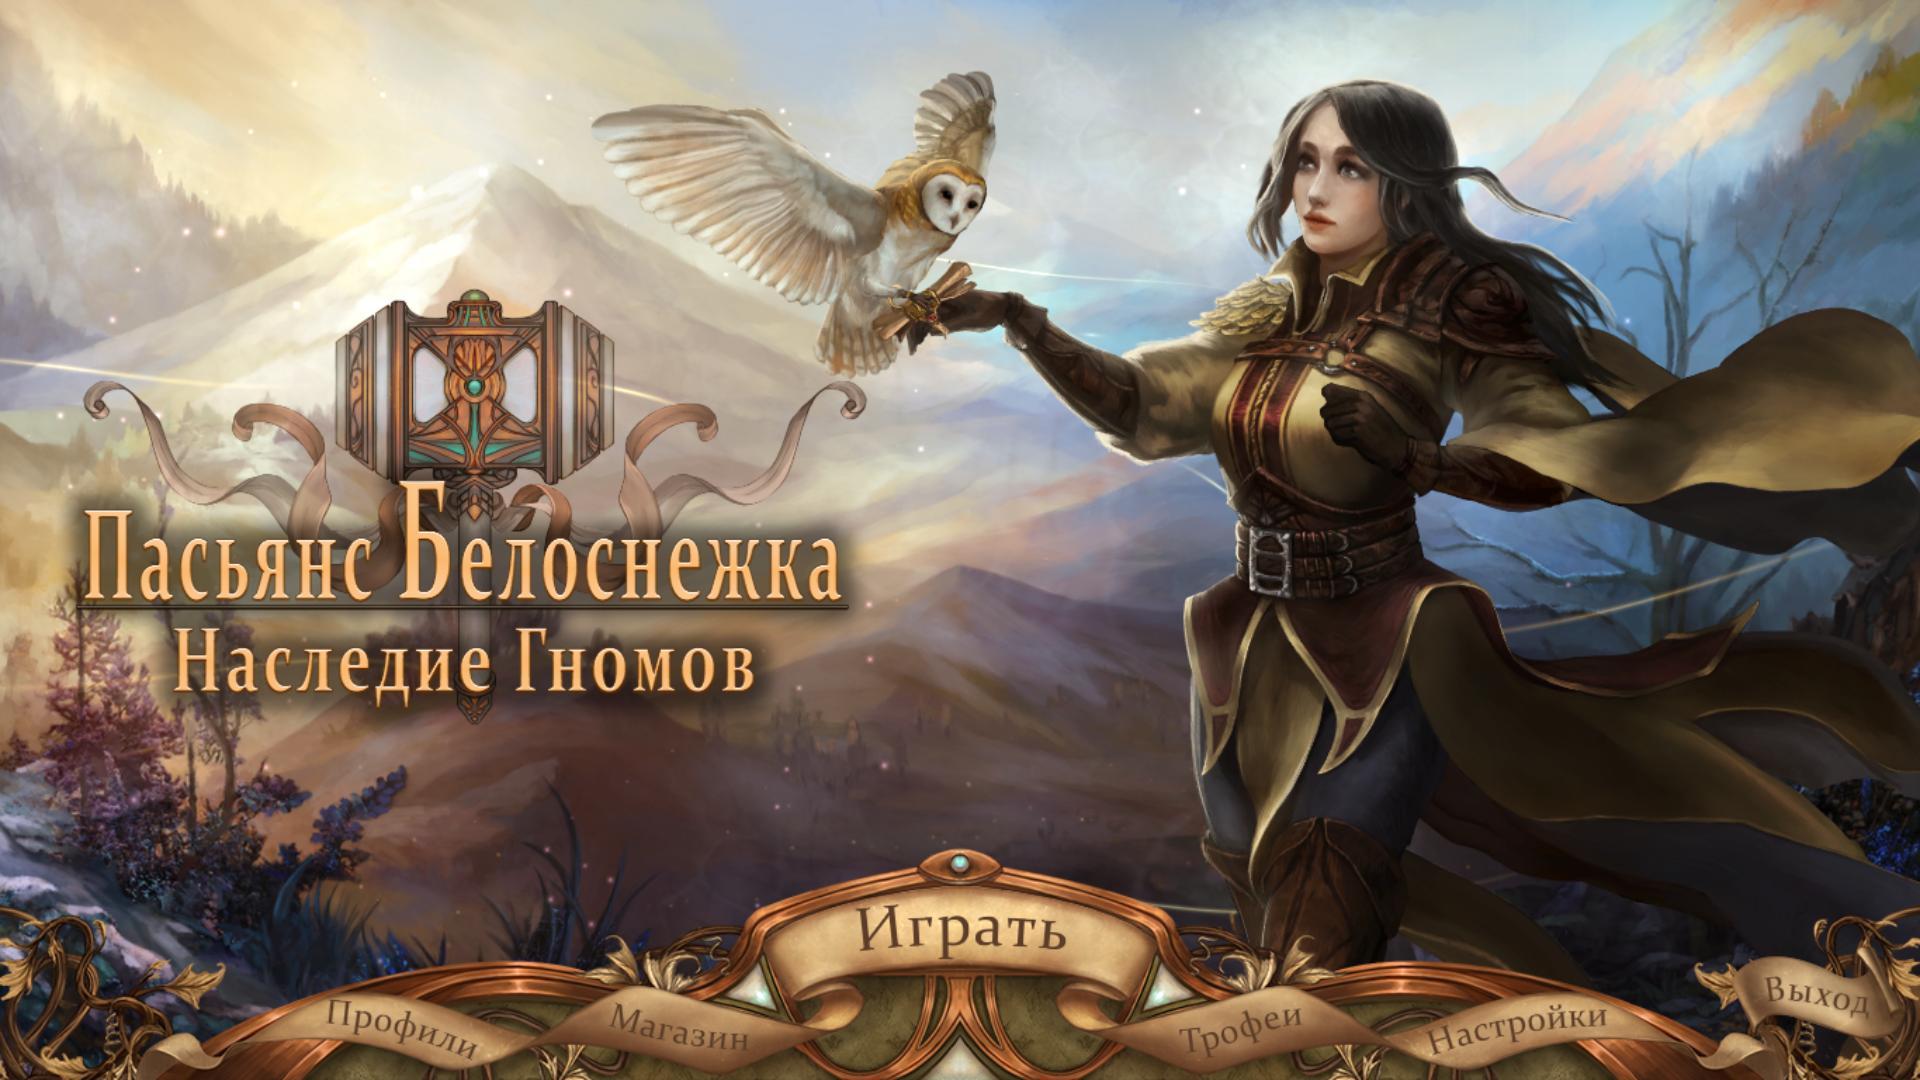 Пасьянс Белоснежка: Наследие Гномов | Snow White Solitaire: Legacy of Dwarves (Rus)